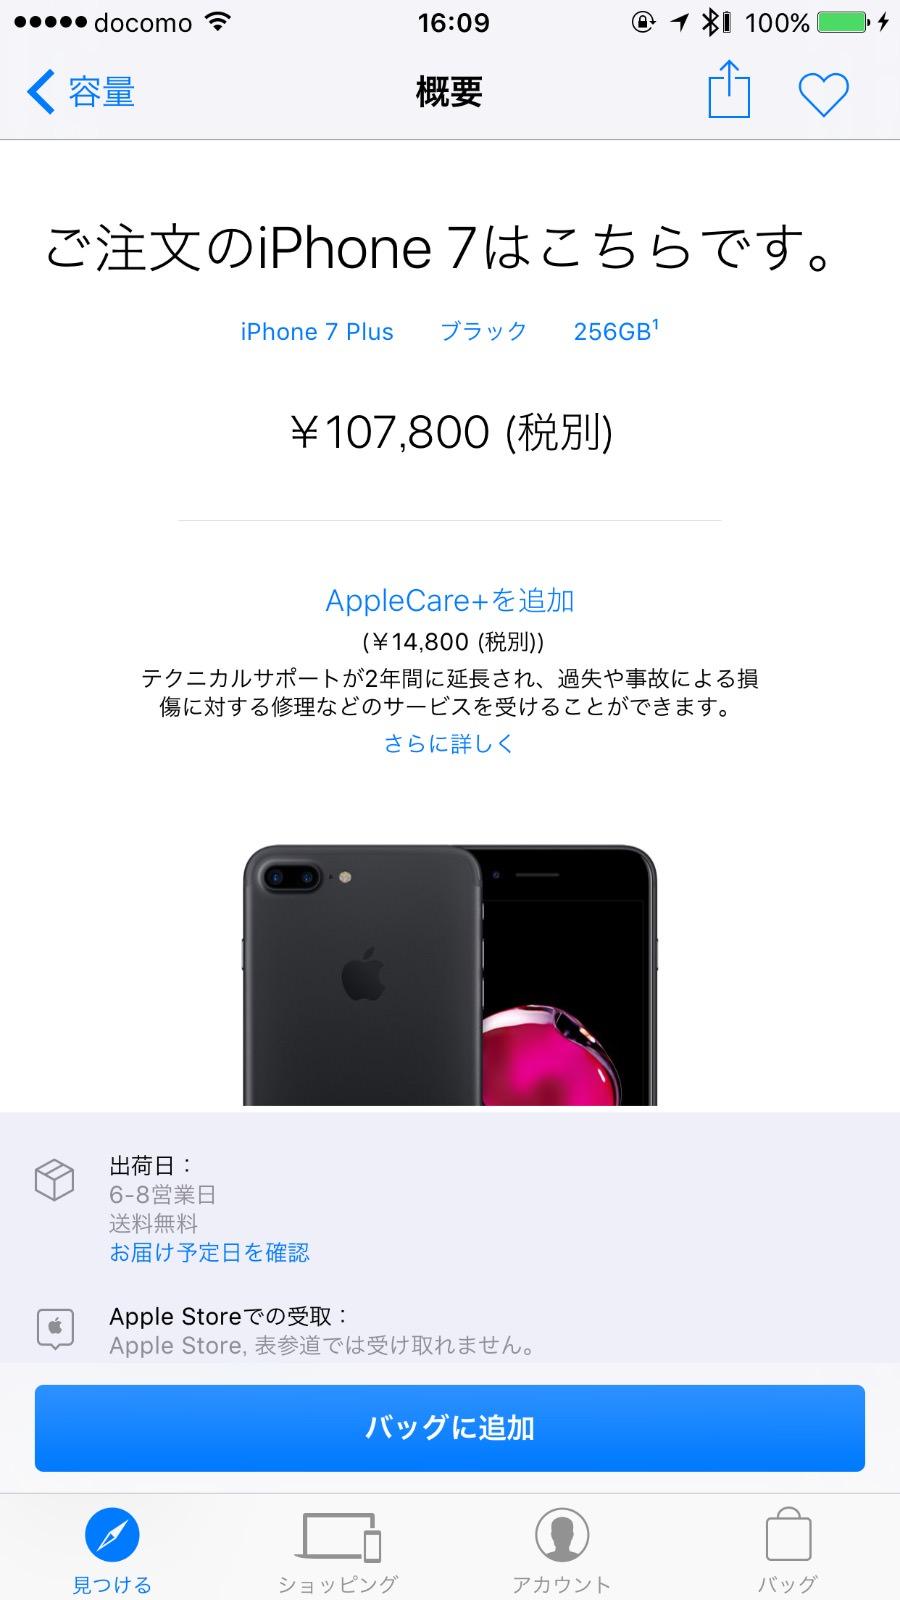 Iphone 7 get 8314